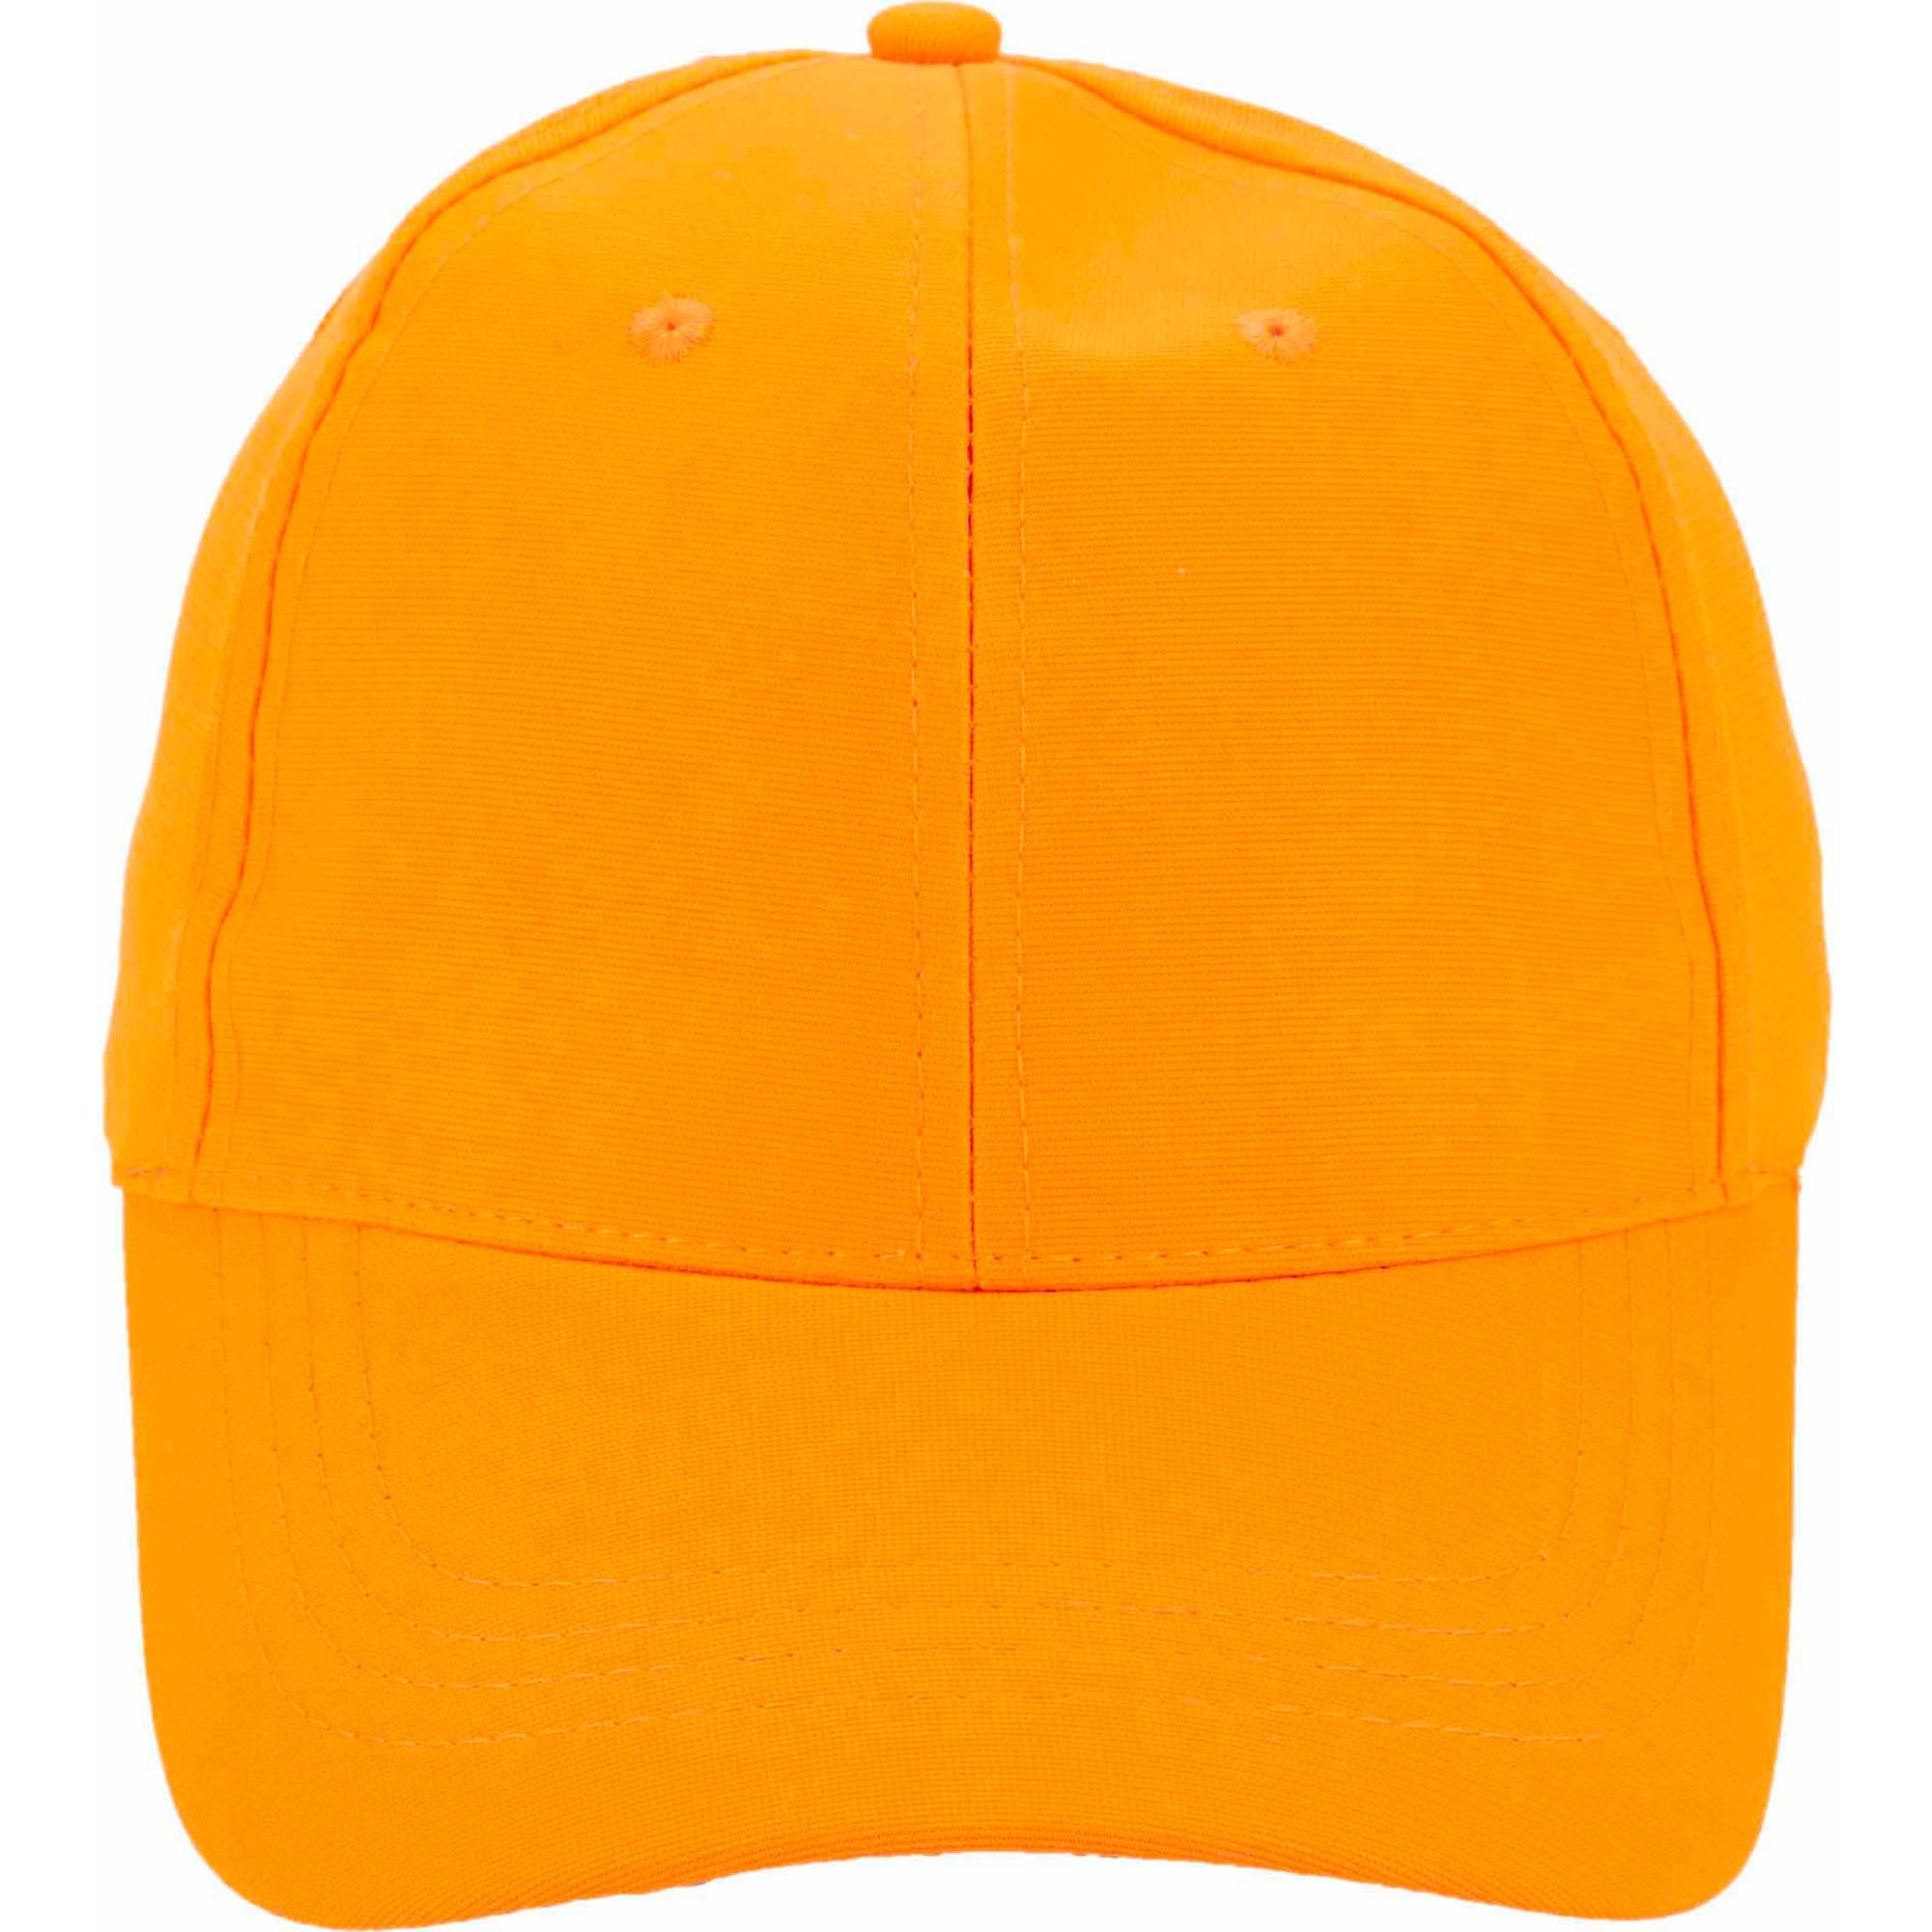 Blaze Orange Hunting Cap - Walmart.com 8df0d60f533